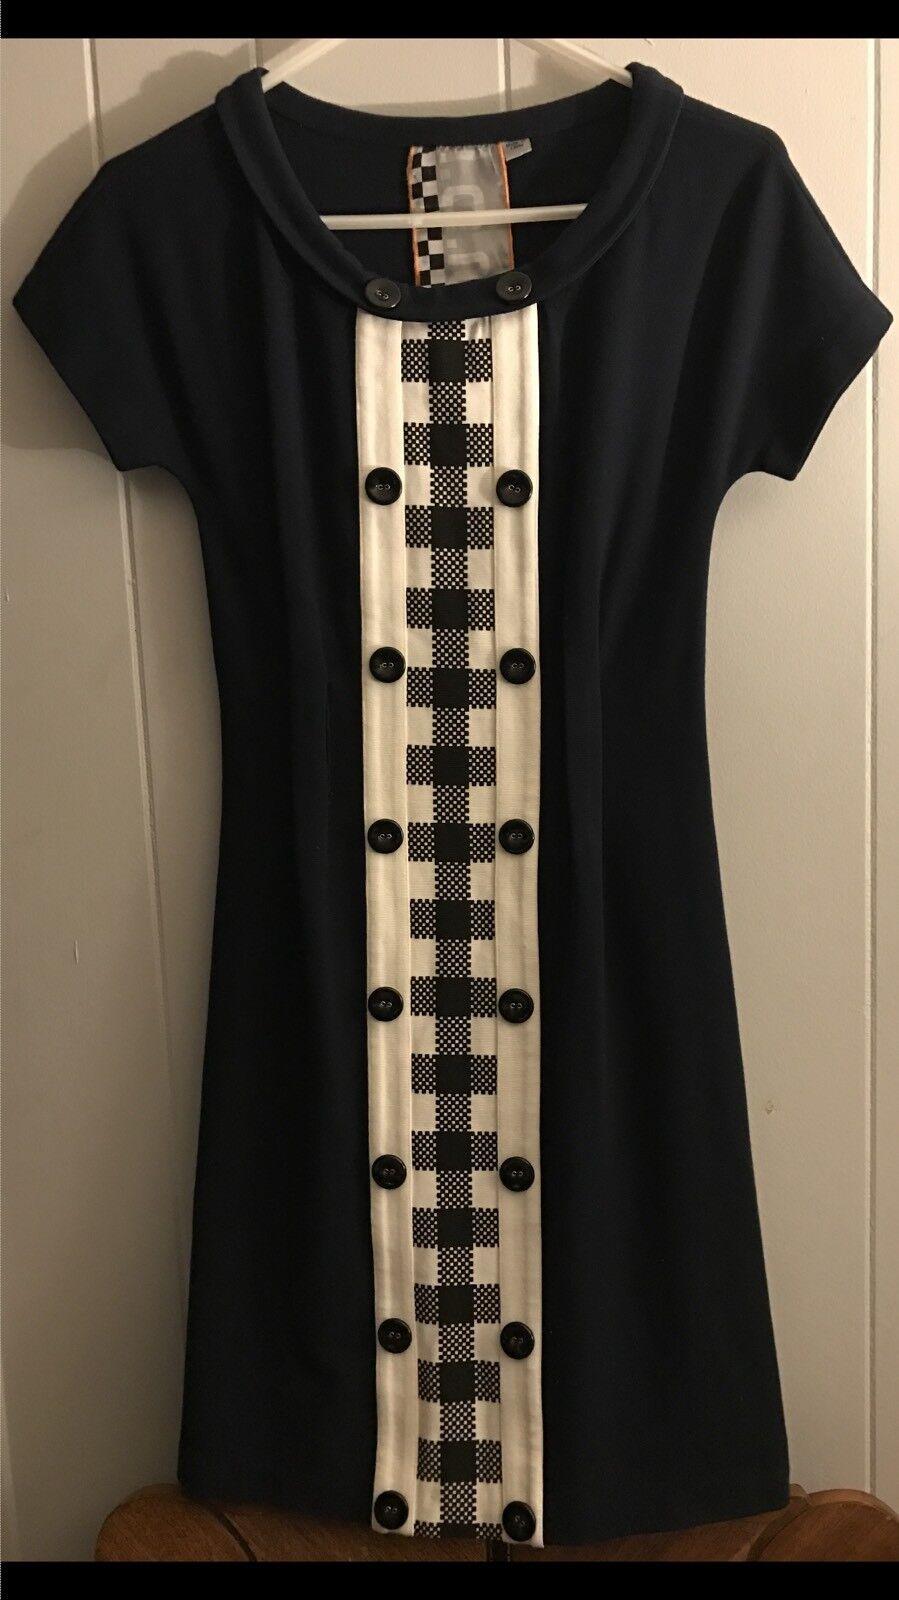 Women's L.A.M.B. Navy Dress Sz. 4